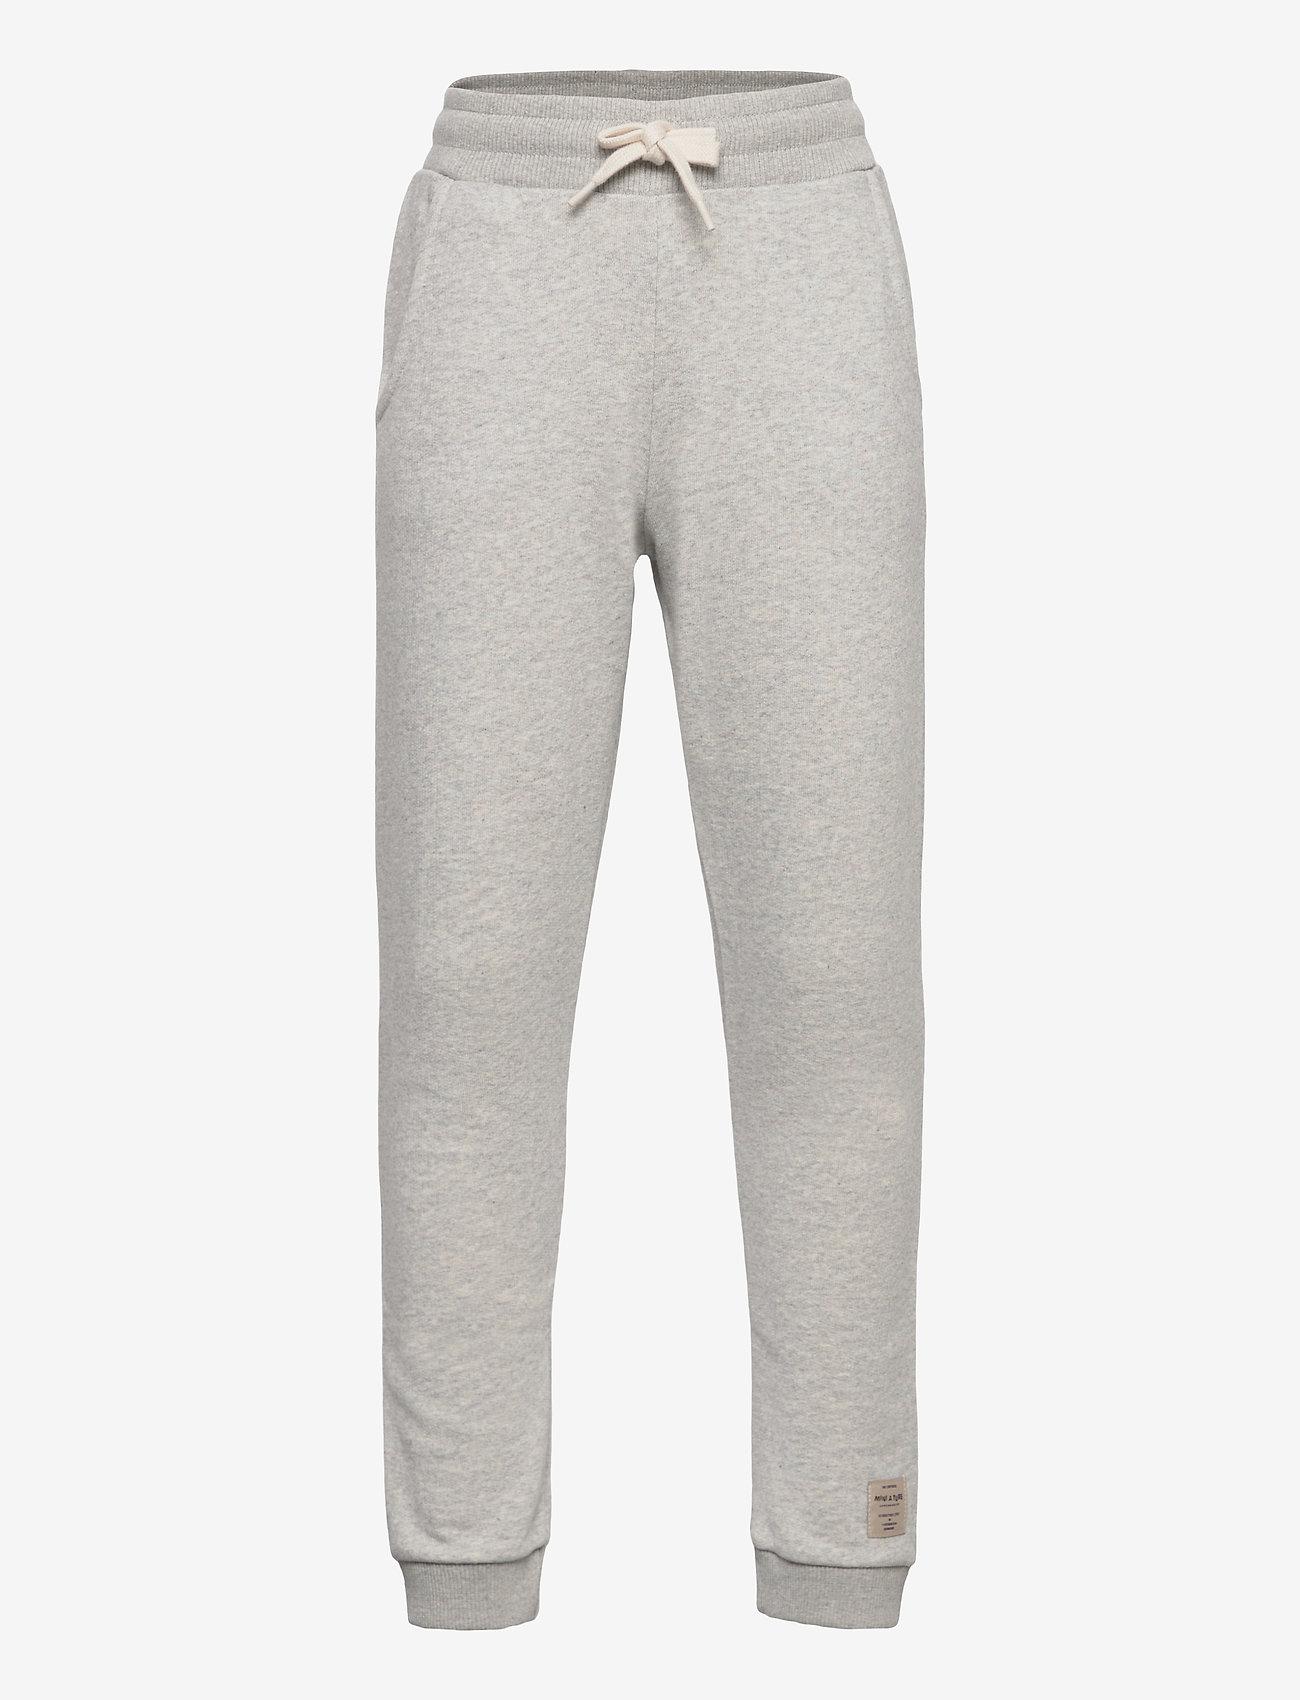 Mini A Ture - Even pants, K - sweatpants - light grey melange - 0